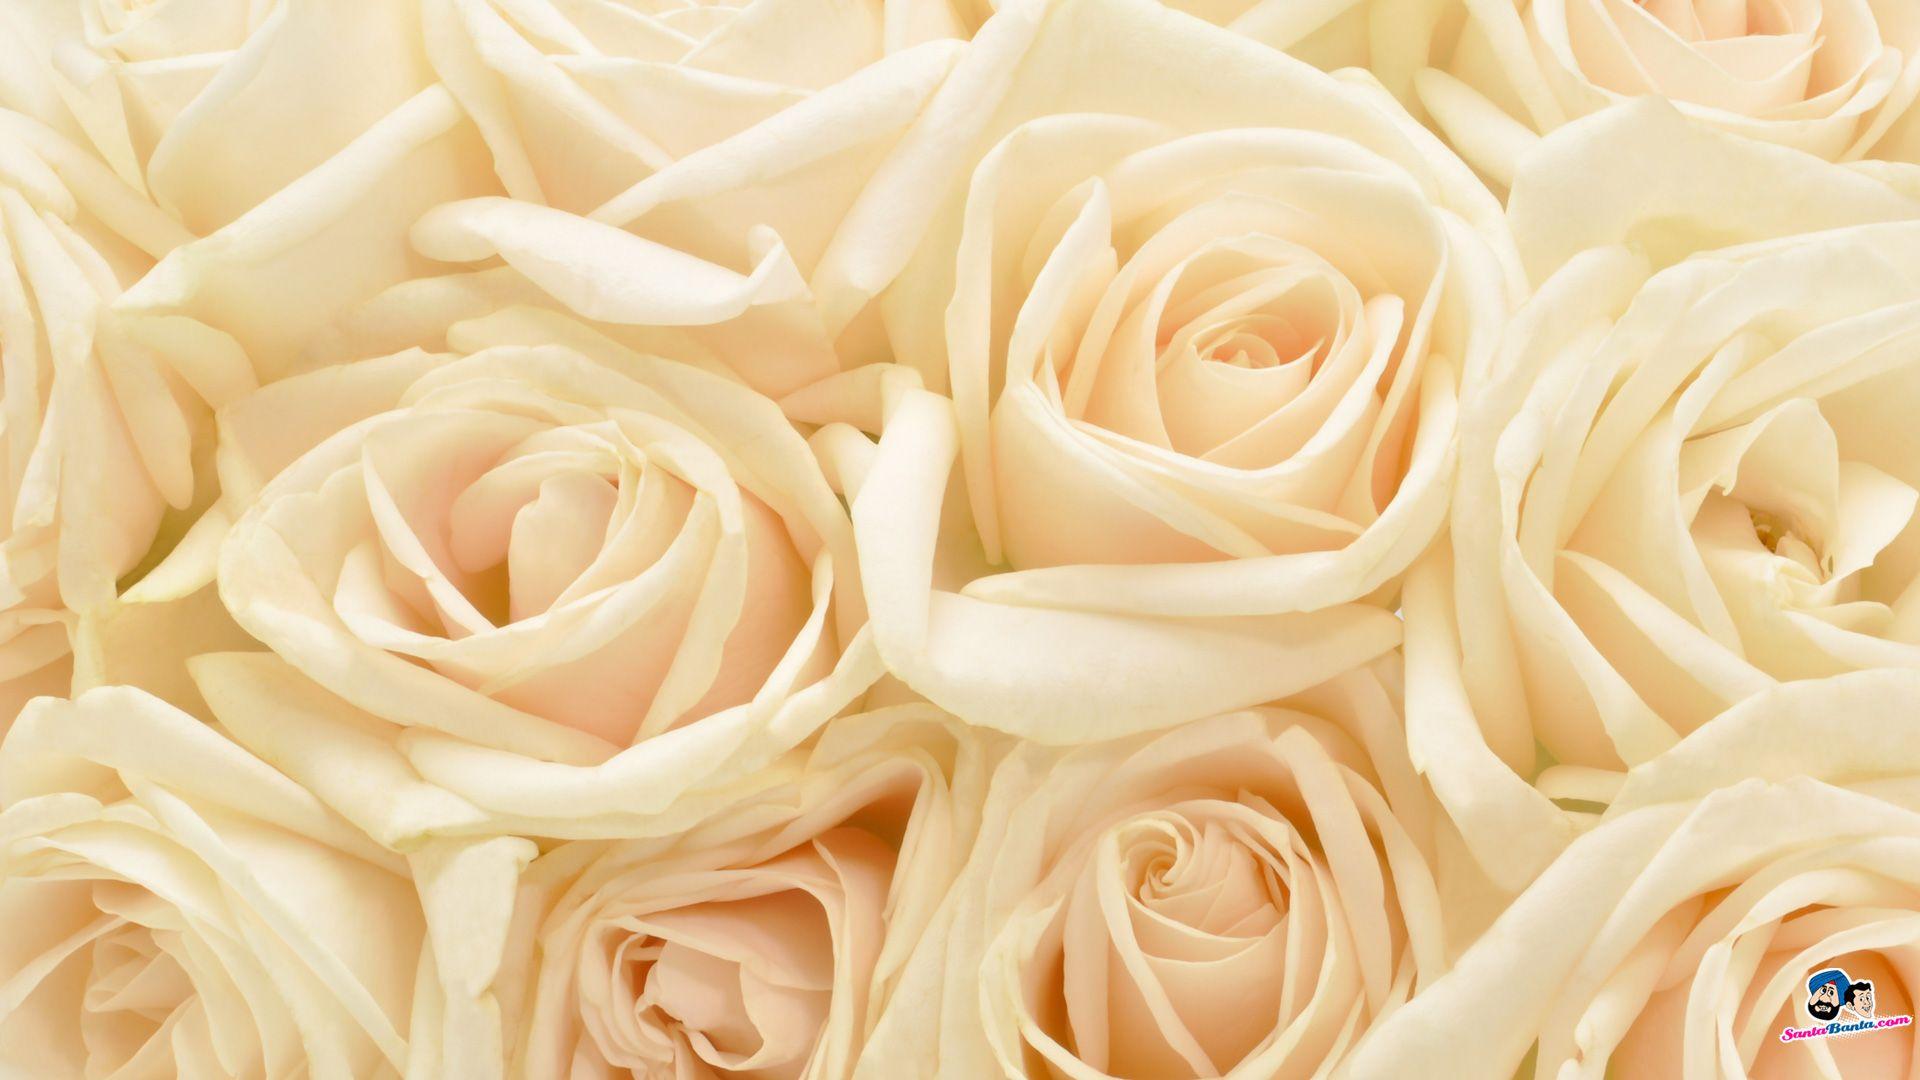 White Roses Background - WallpaperSafari